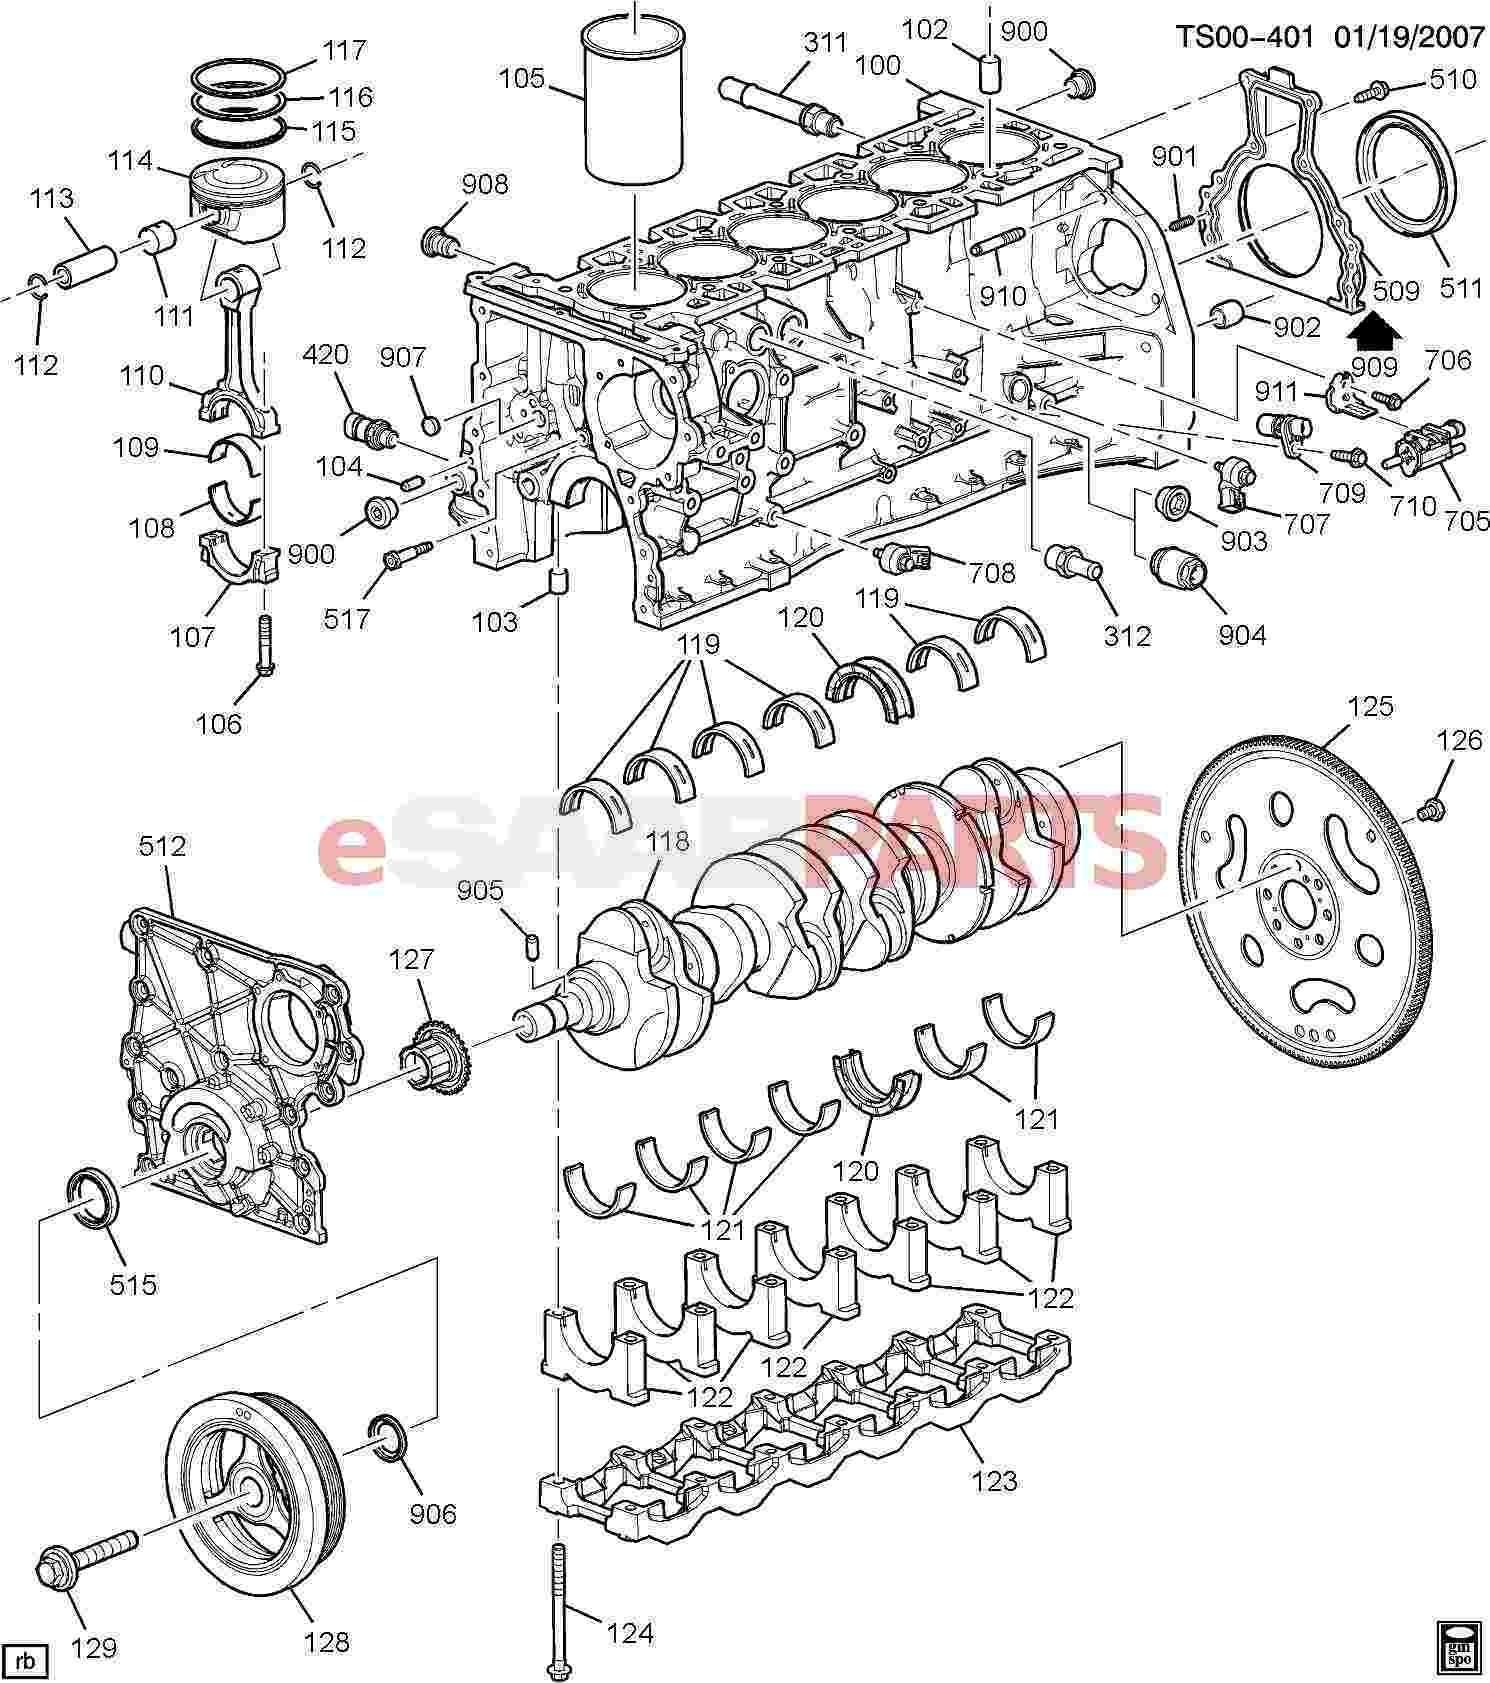 Car Engine Parts with Diagram Esaabparts Of Car Engine Parts with Diagram